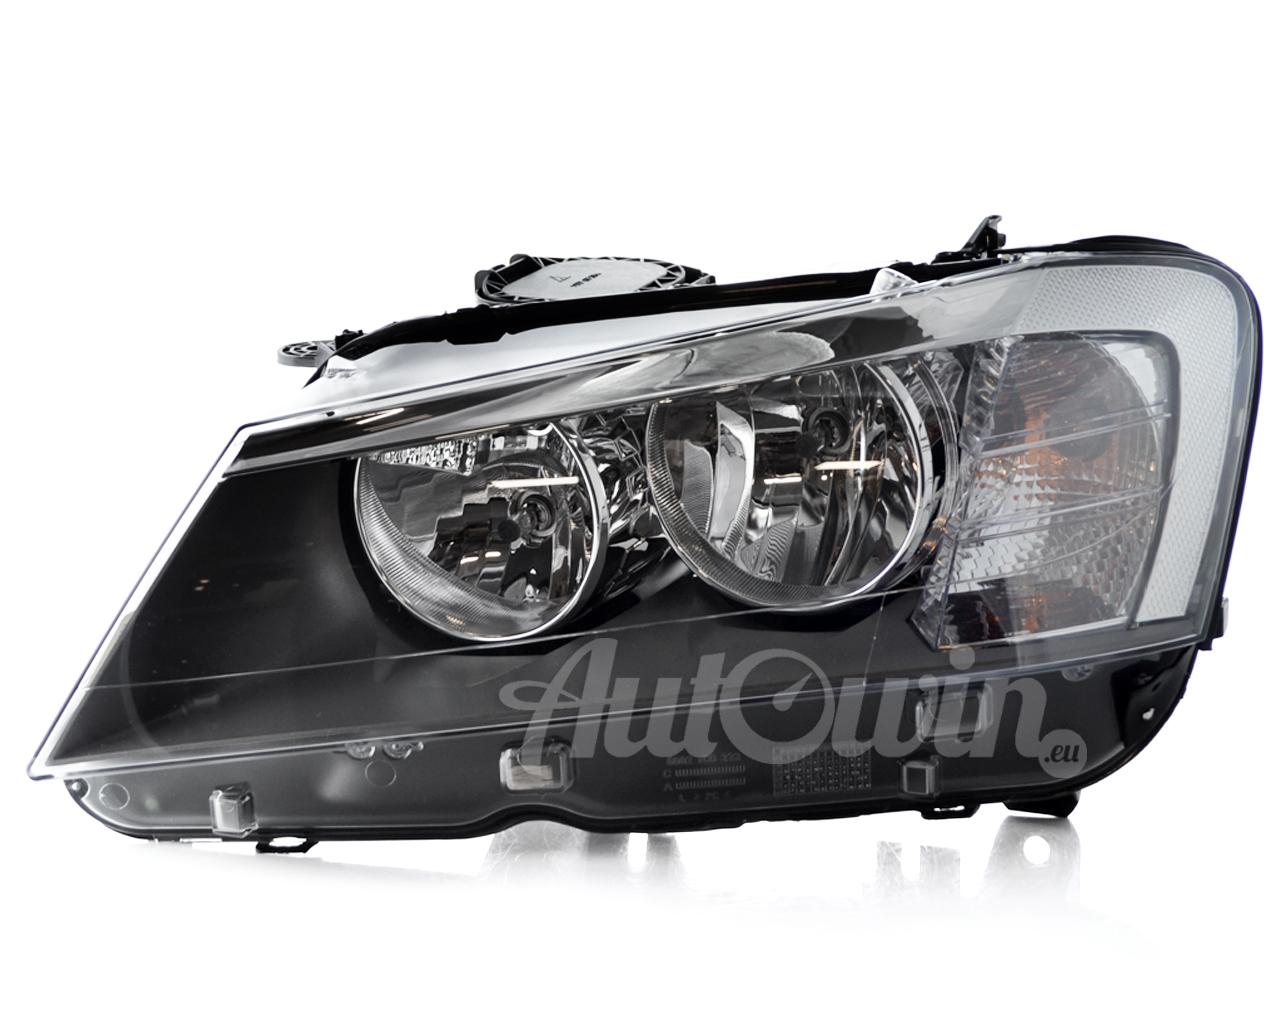 Bmw X3 Series F25 Halogen Headlight Lh Left Side Genuine Oem New 63127217287 Ebay